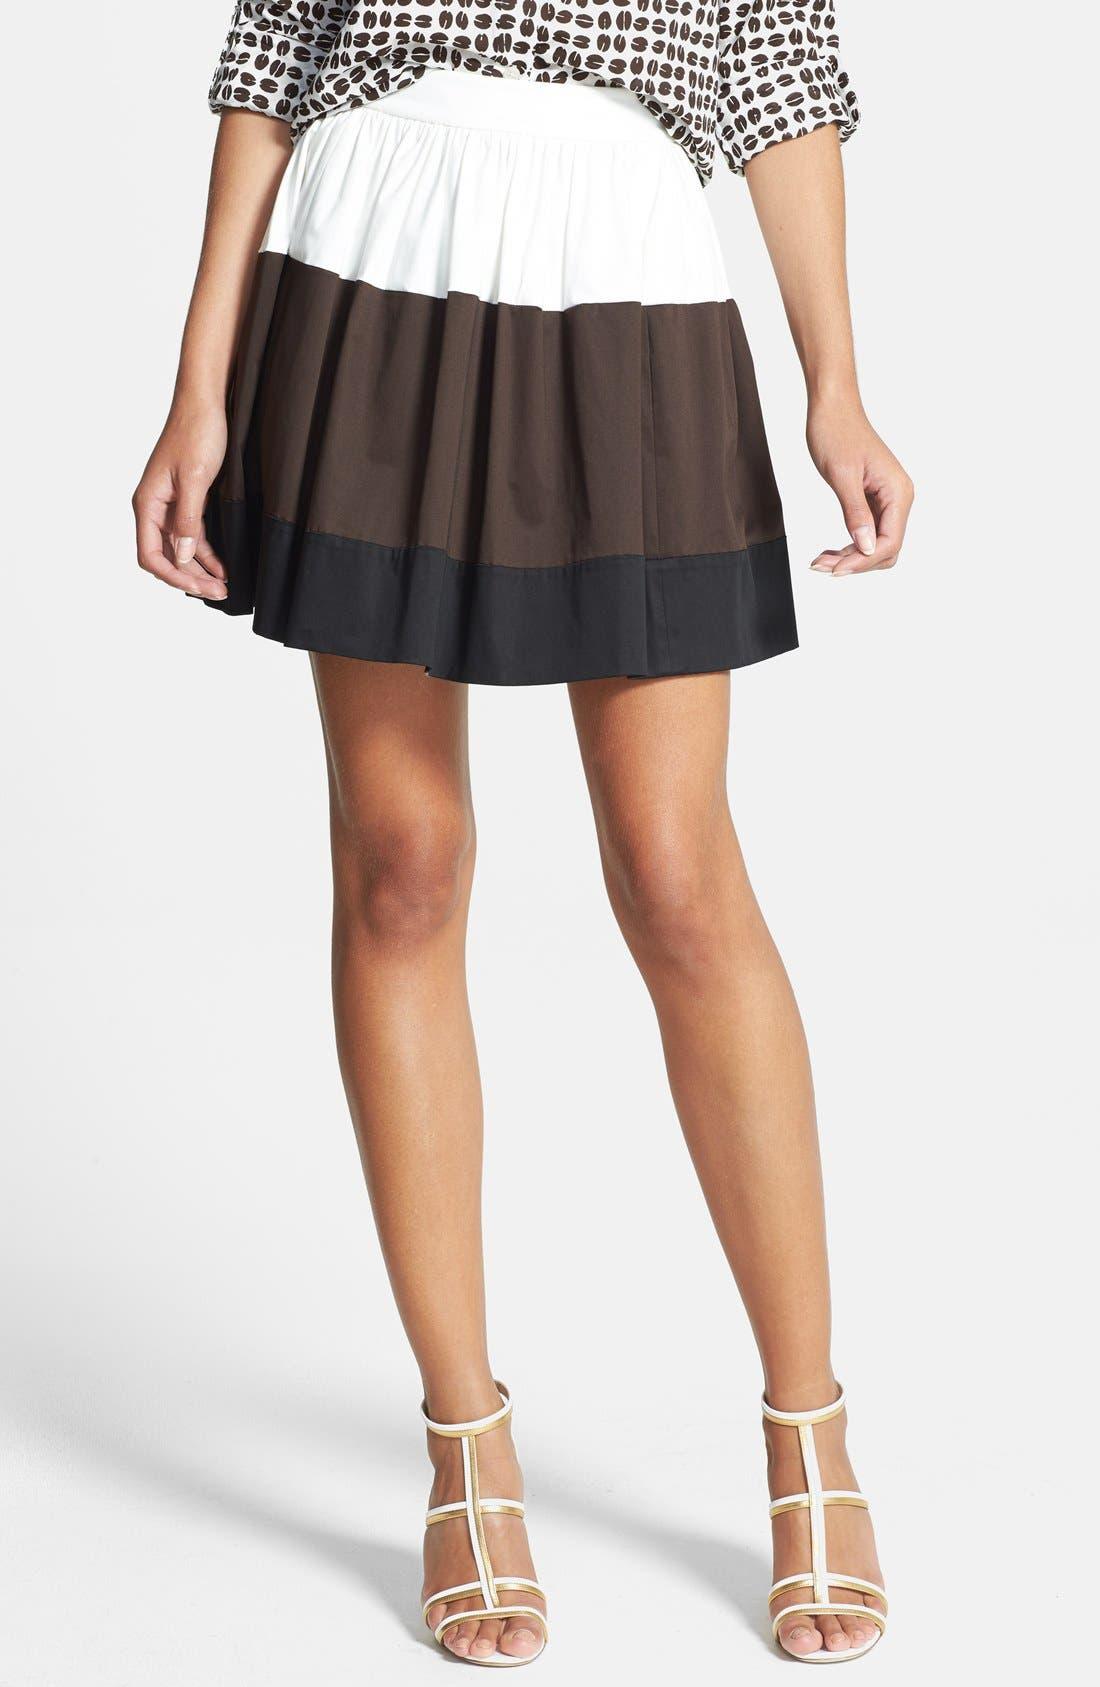 Alternate Image 1 Selected - kate spade new york 'coreen' colorblock skirt